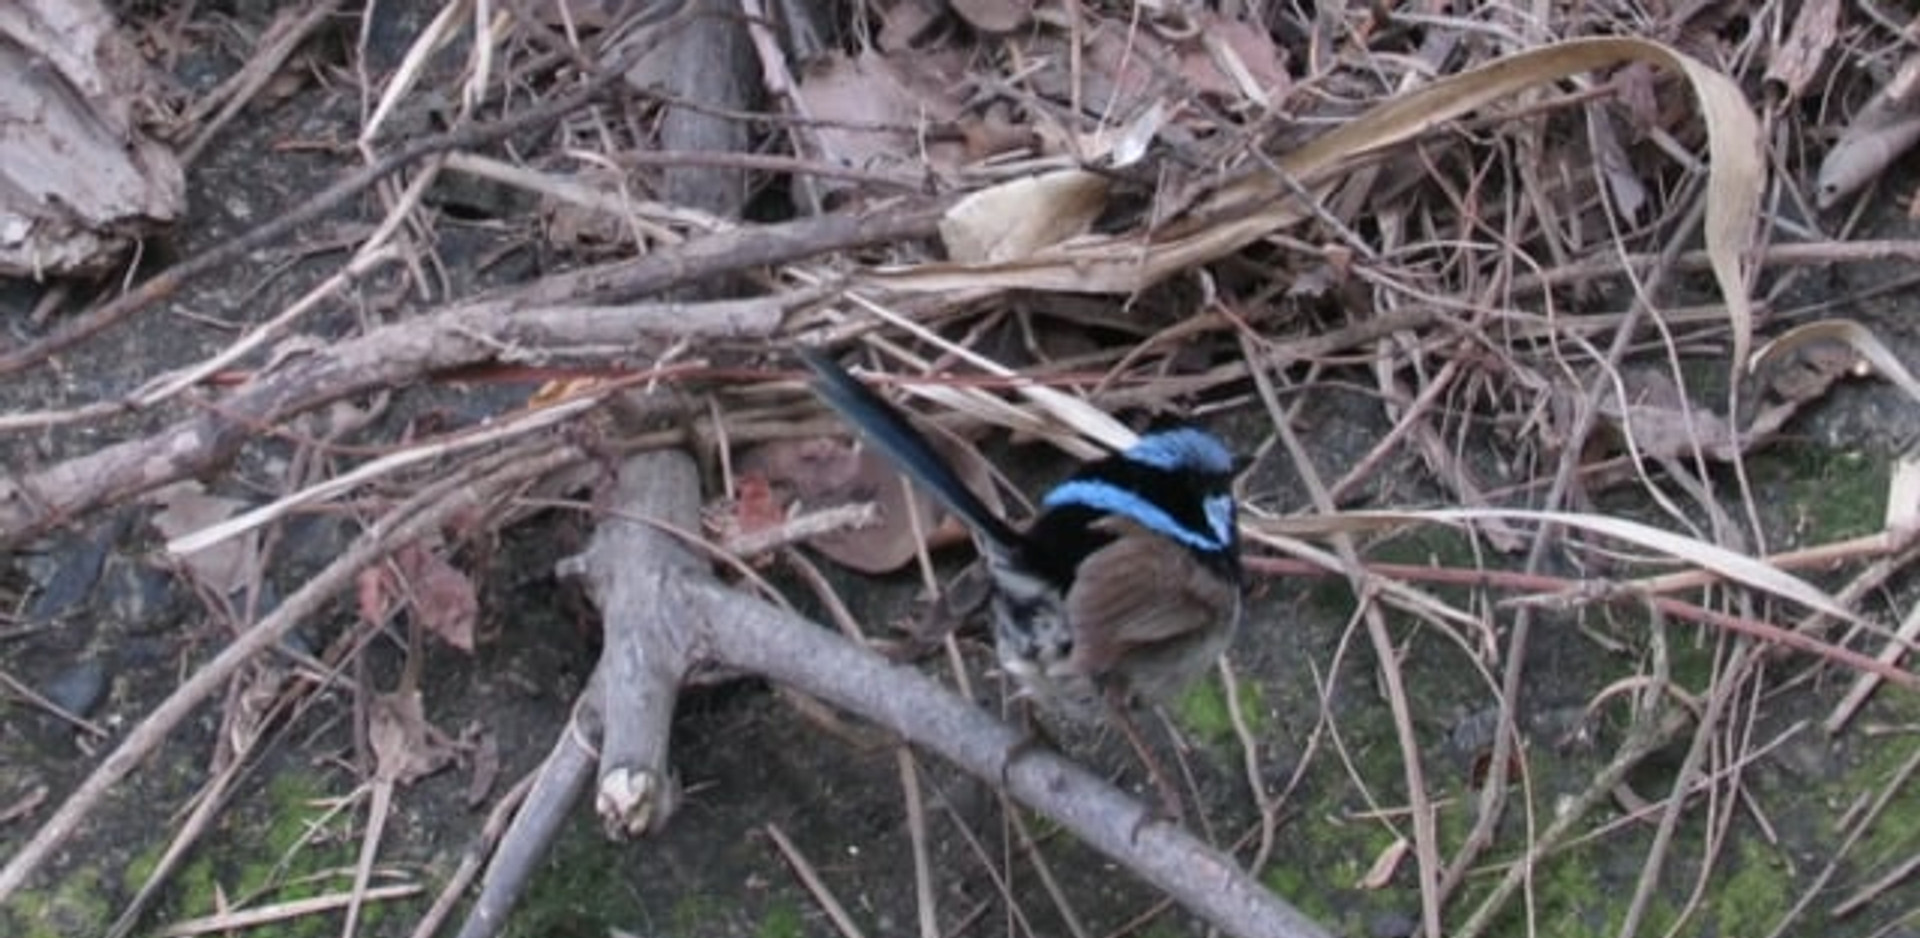 Male Superb Fairy-wren  male foraging on creek embankment